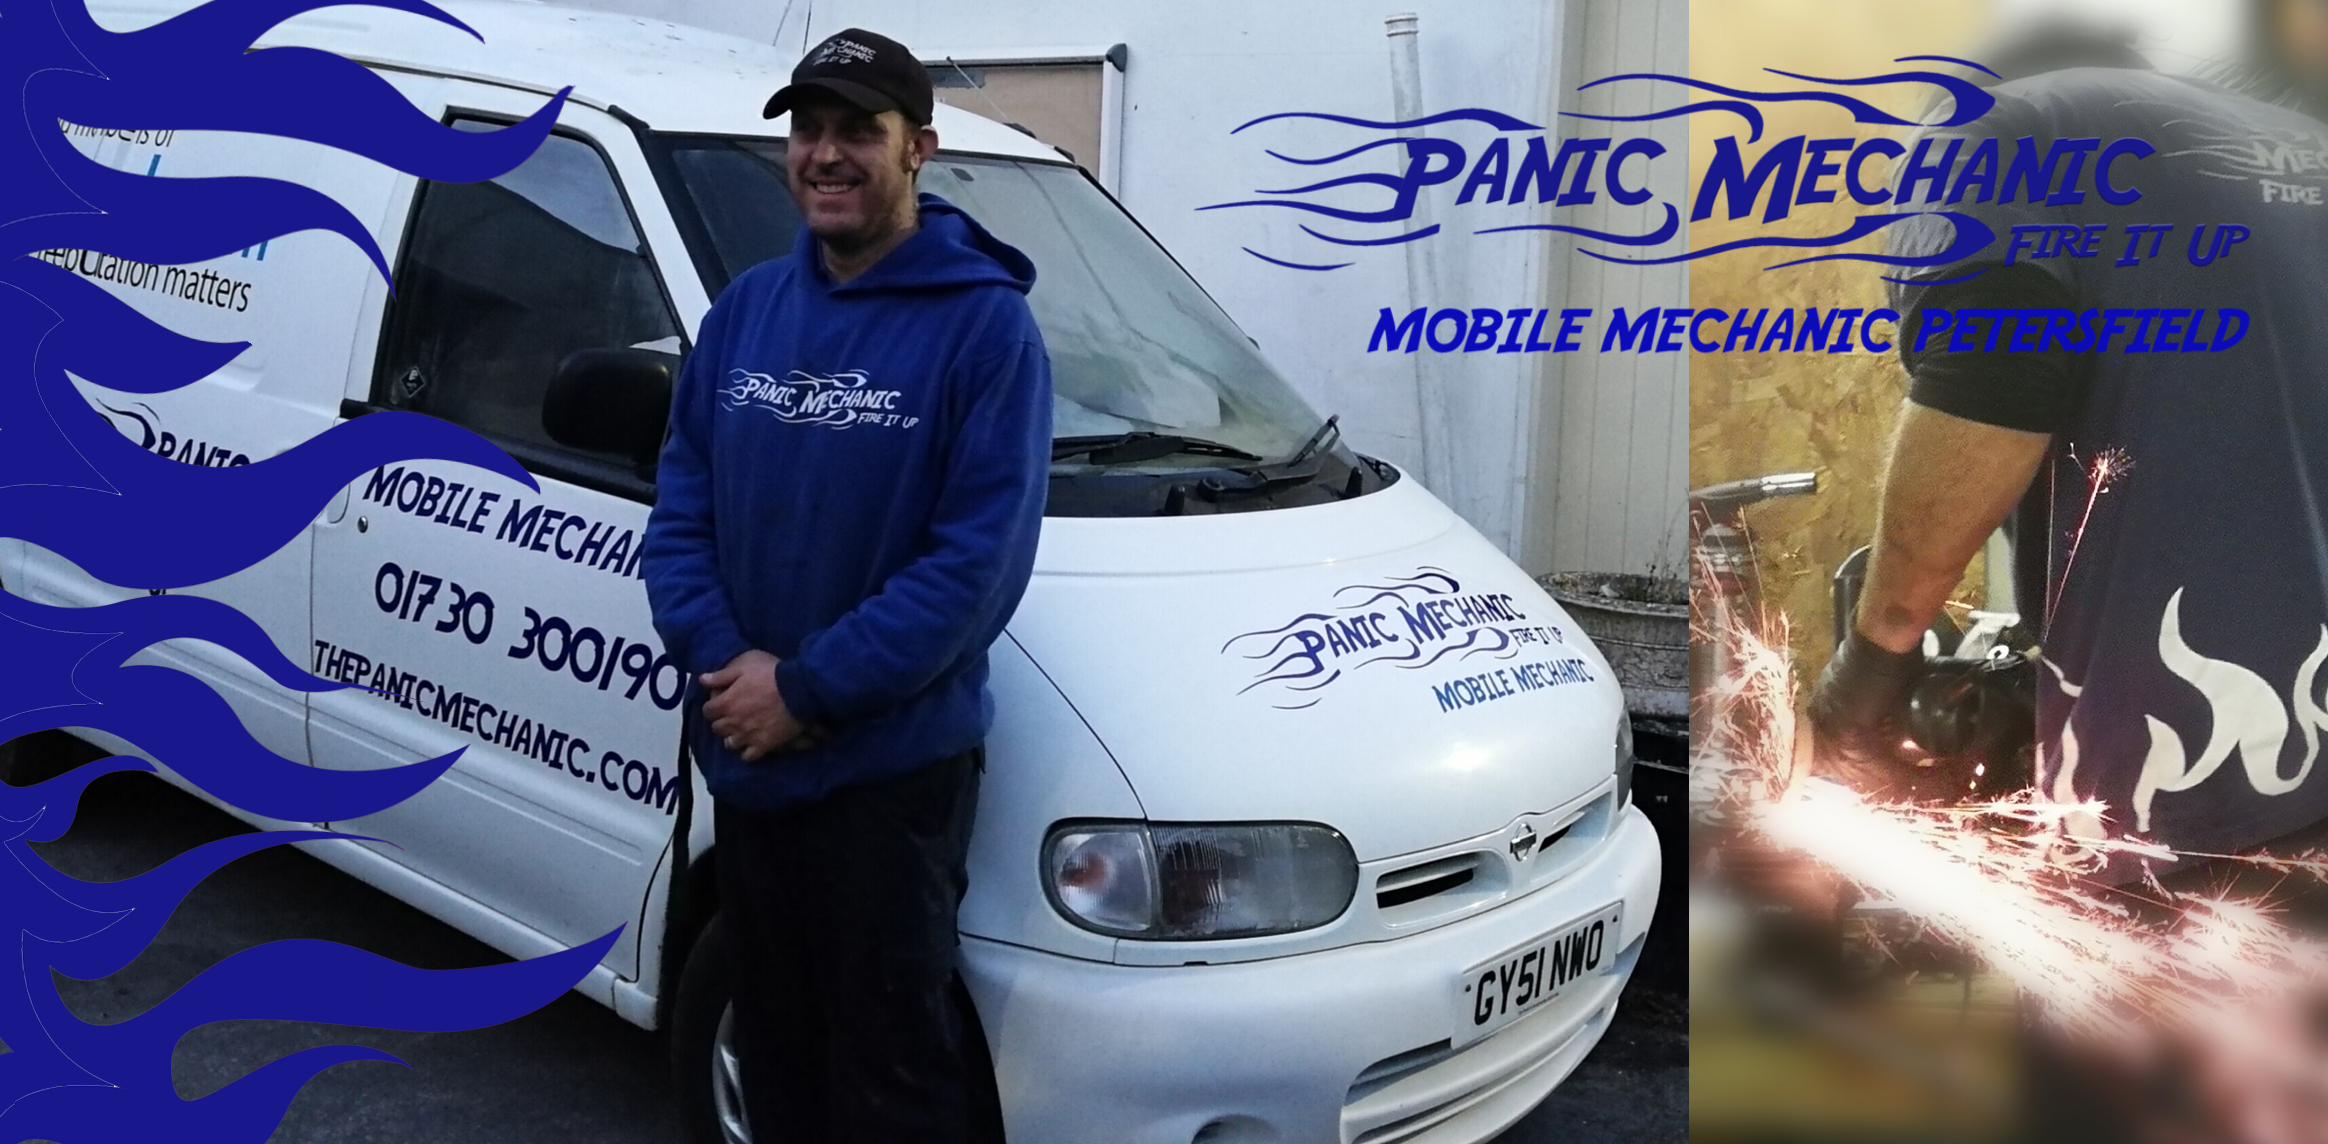 Panic Mechanic Service